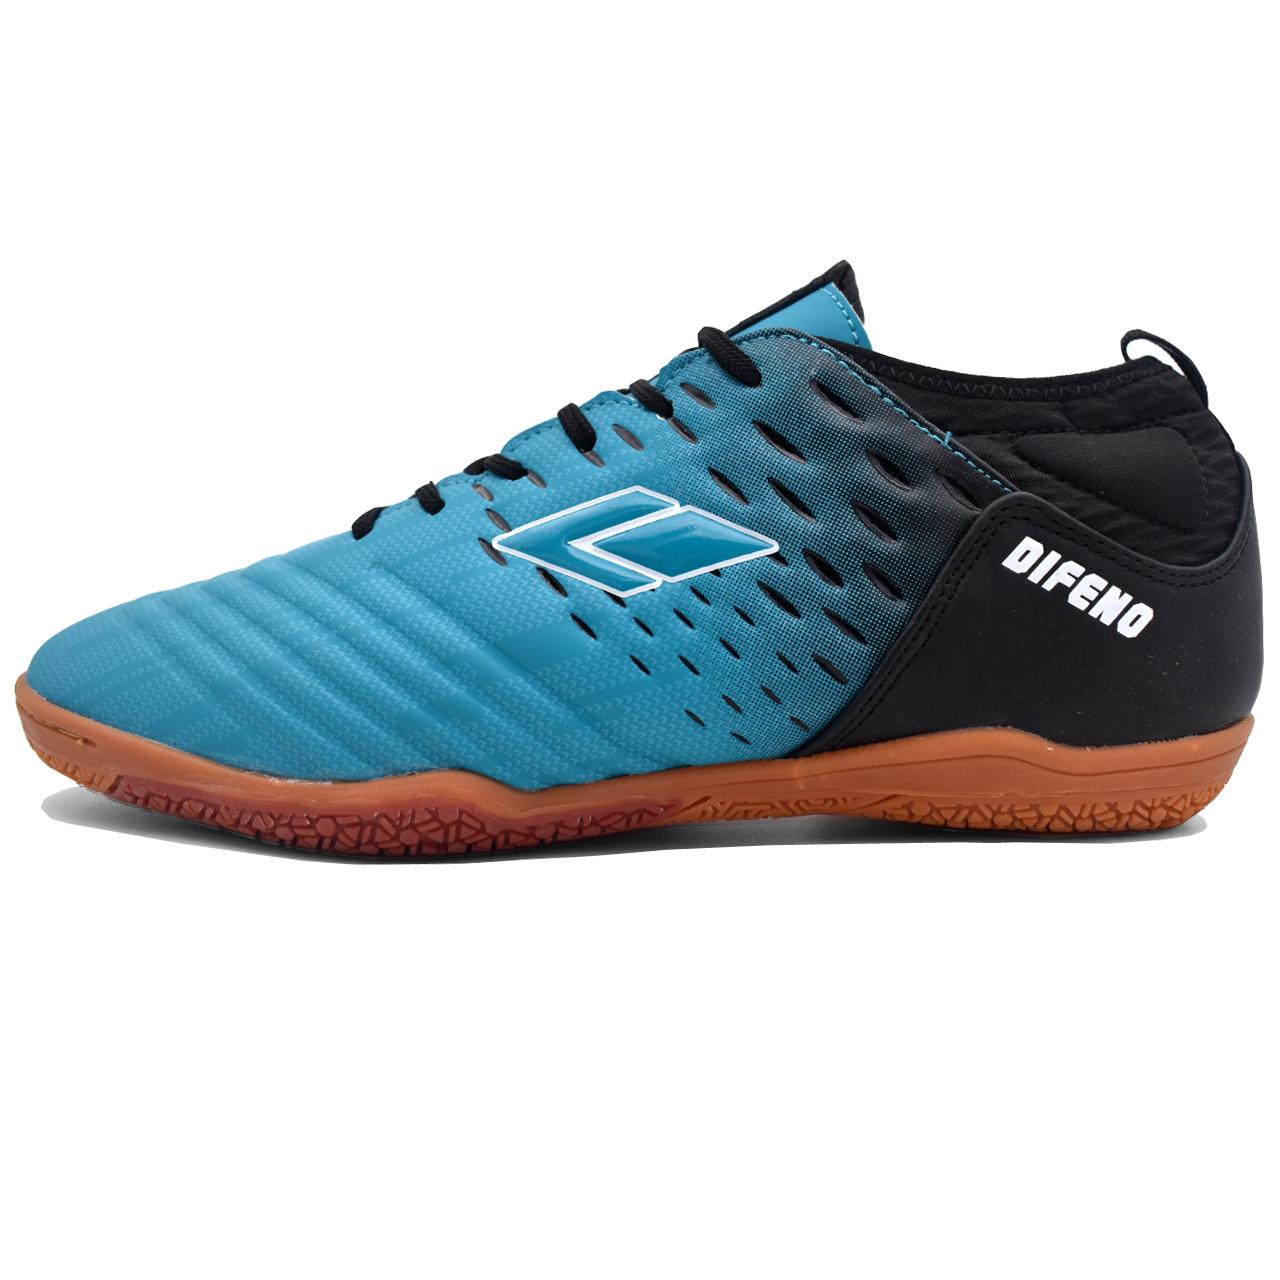 کفش فوتسال مردانه دیفانو کد C-5030